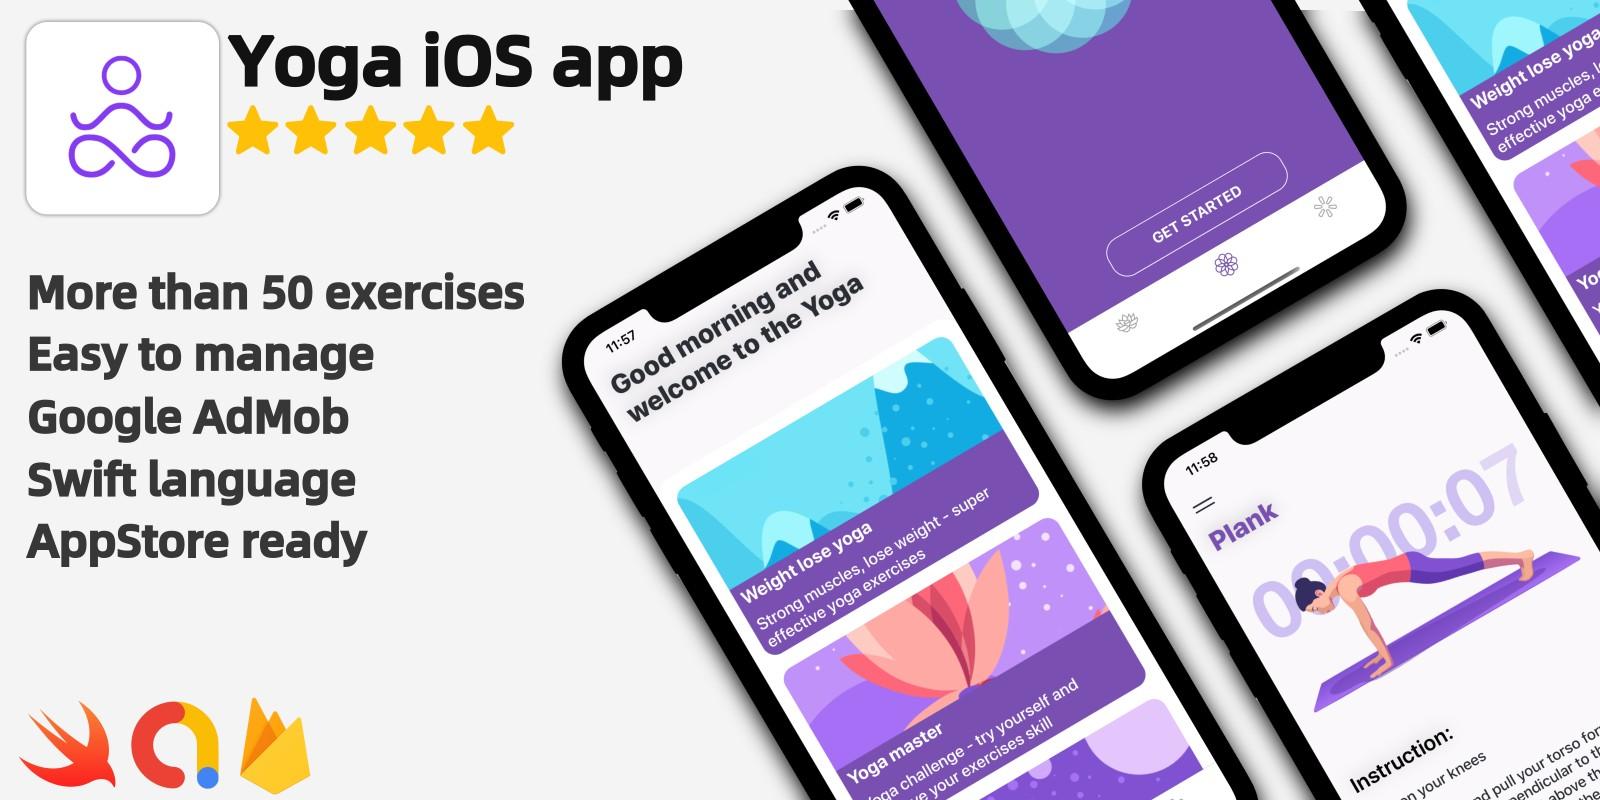 Yoga - Full iOS Yoga Workout Application